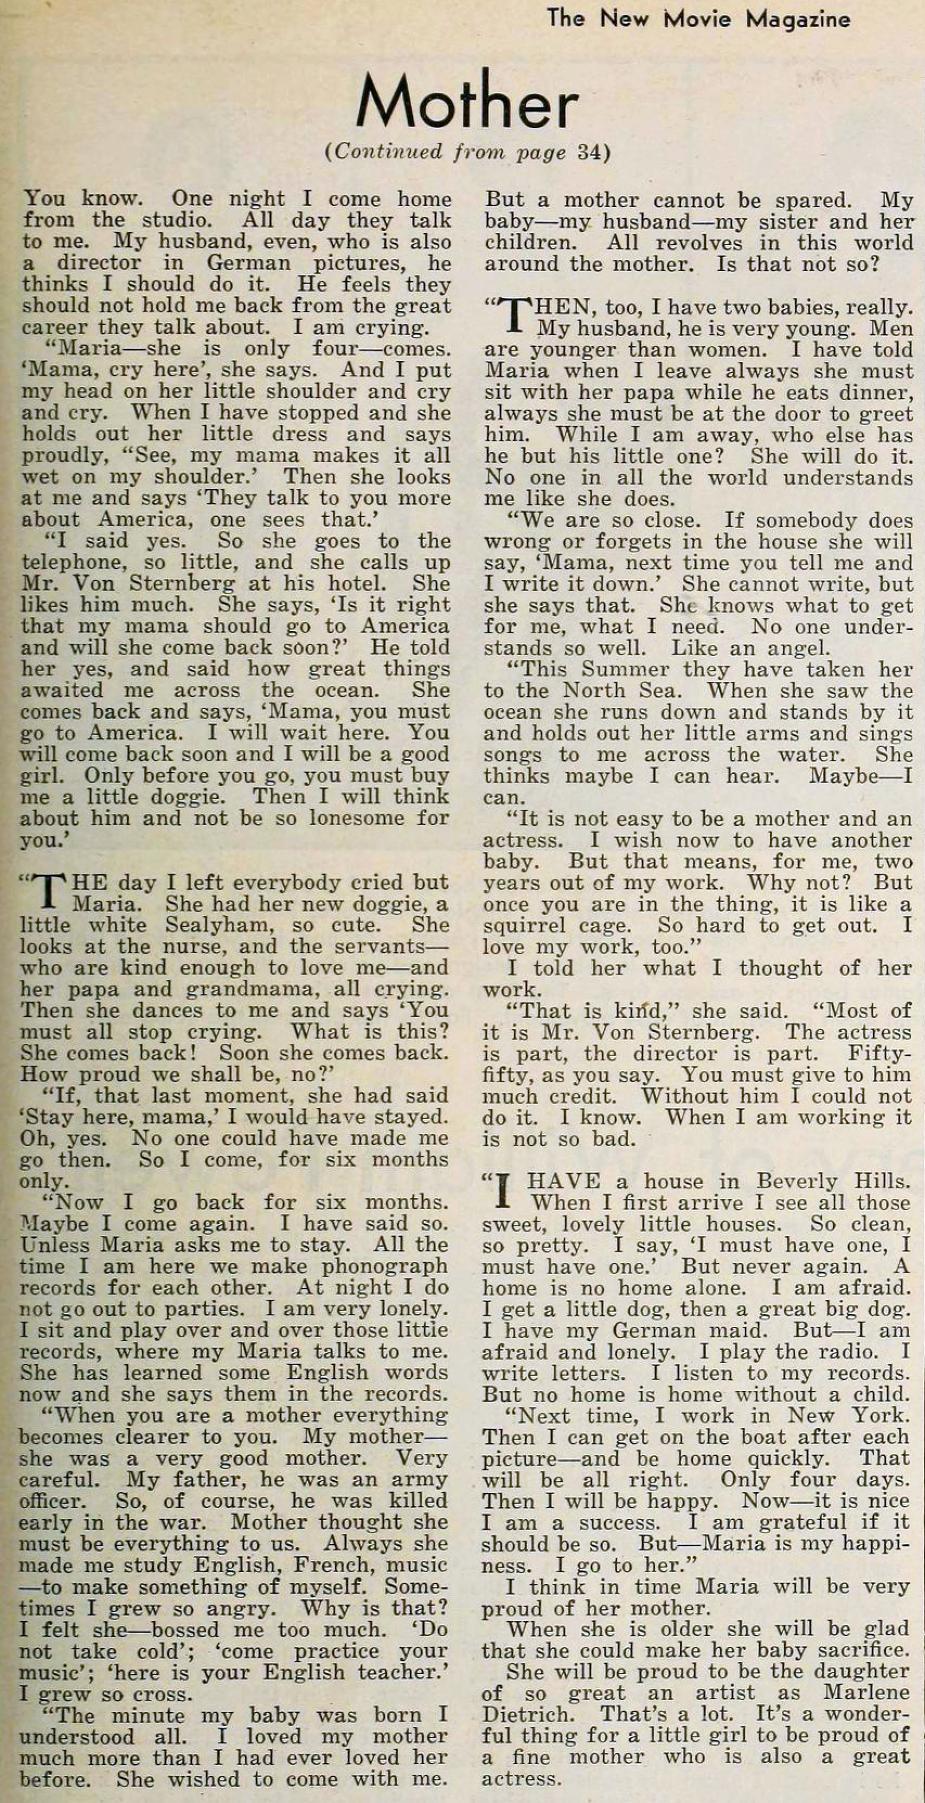 marlene dietrich the new movie magazine january 1931da